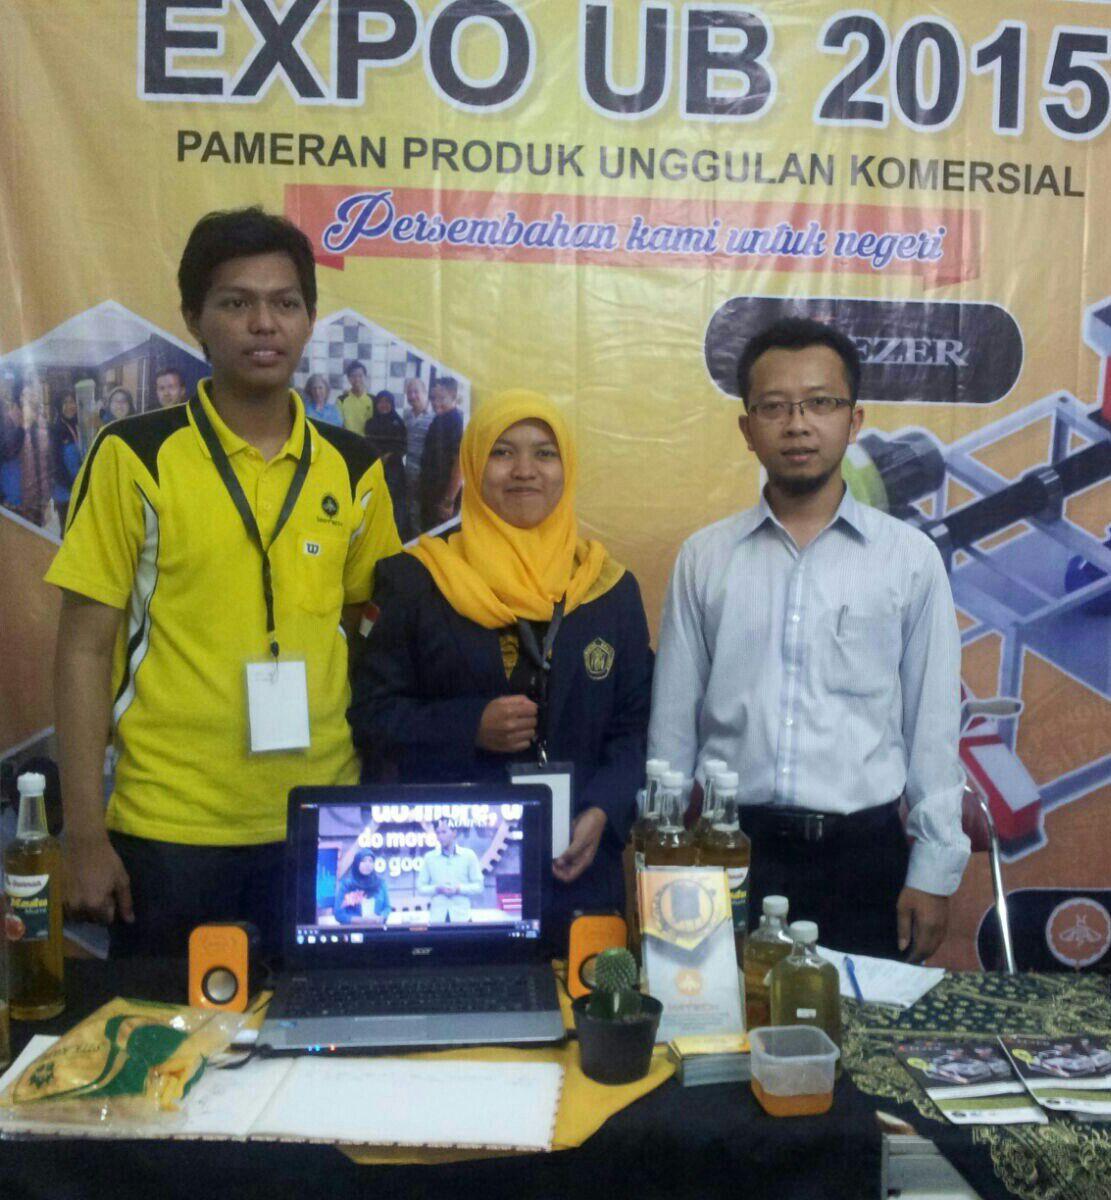 Expo UB 2015 Sakri Madu